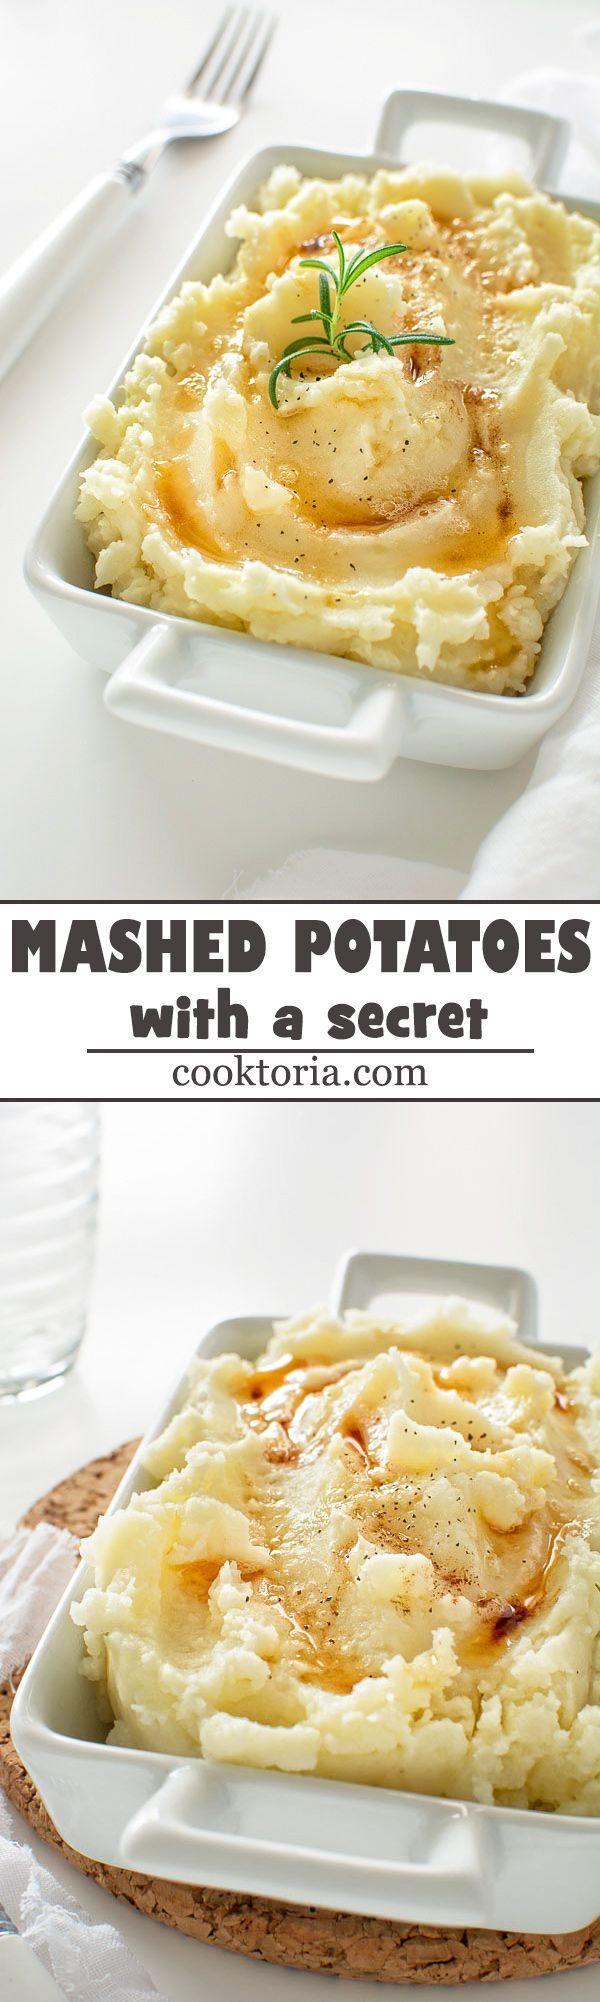 287 best Potato Recipes images on Pinterest | Healthy eats, Potato ...